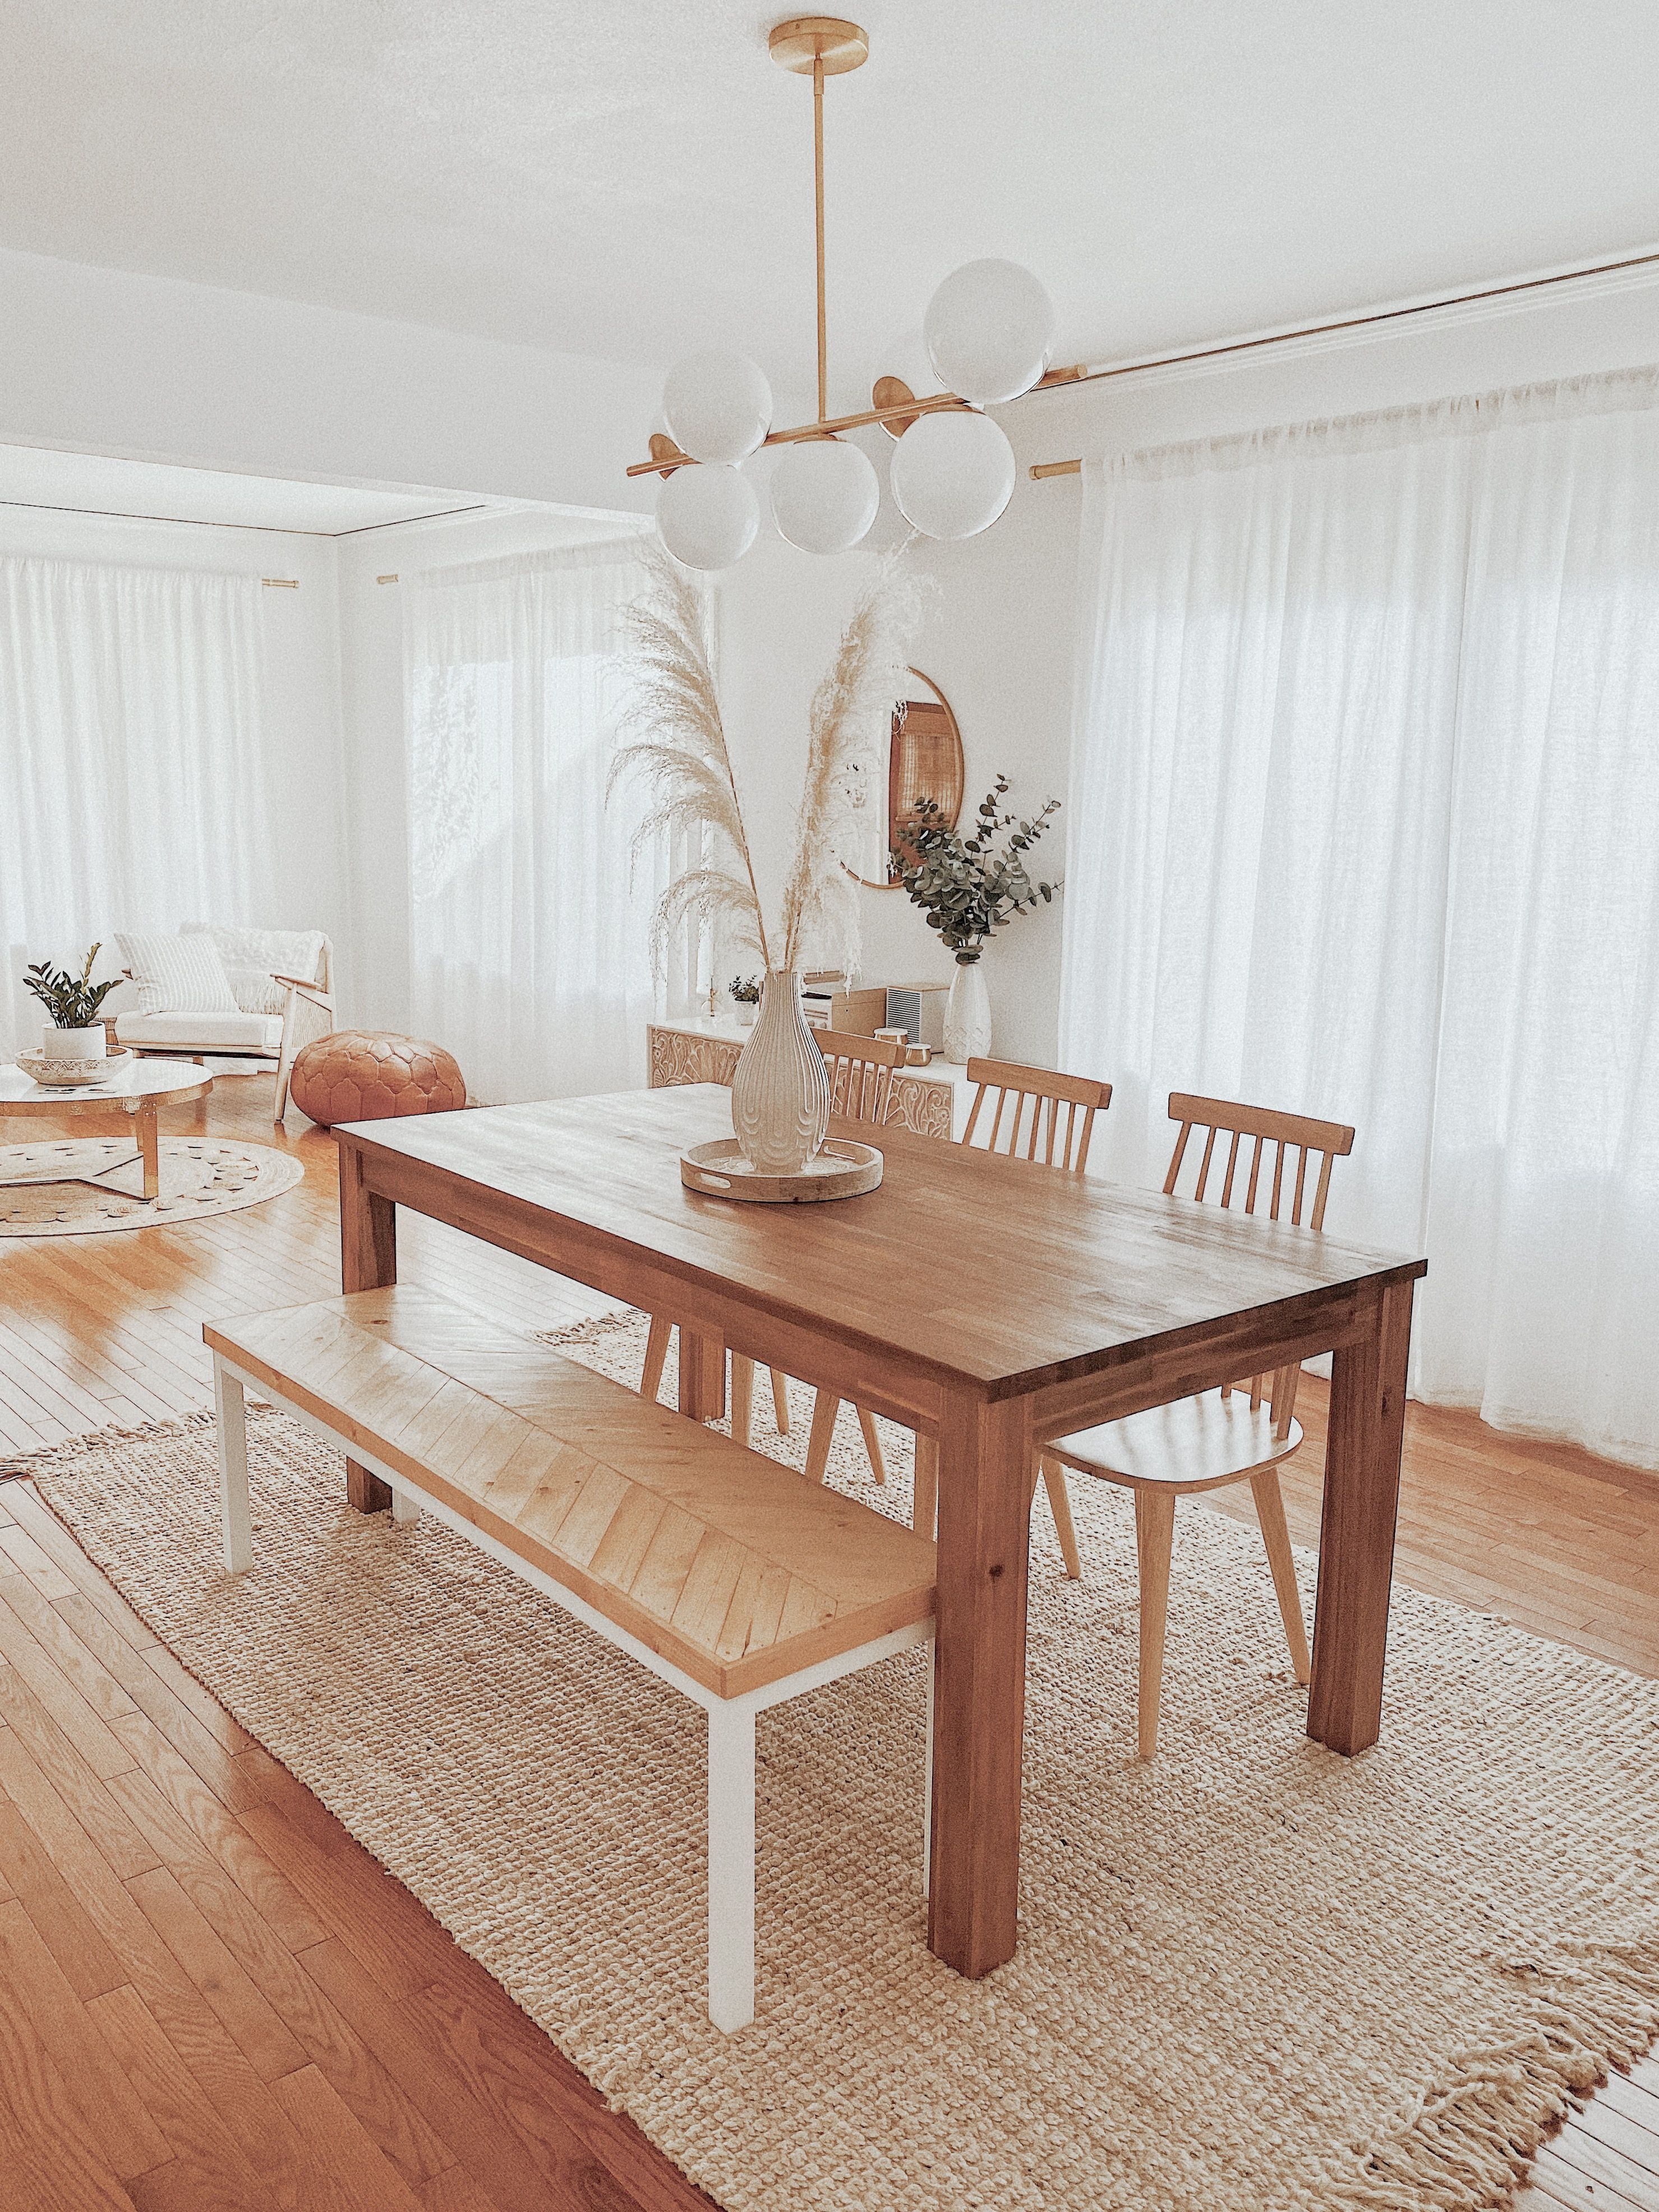 Boho Bohemian White Wood Cozy Dining Room Living Space Home Decor